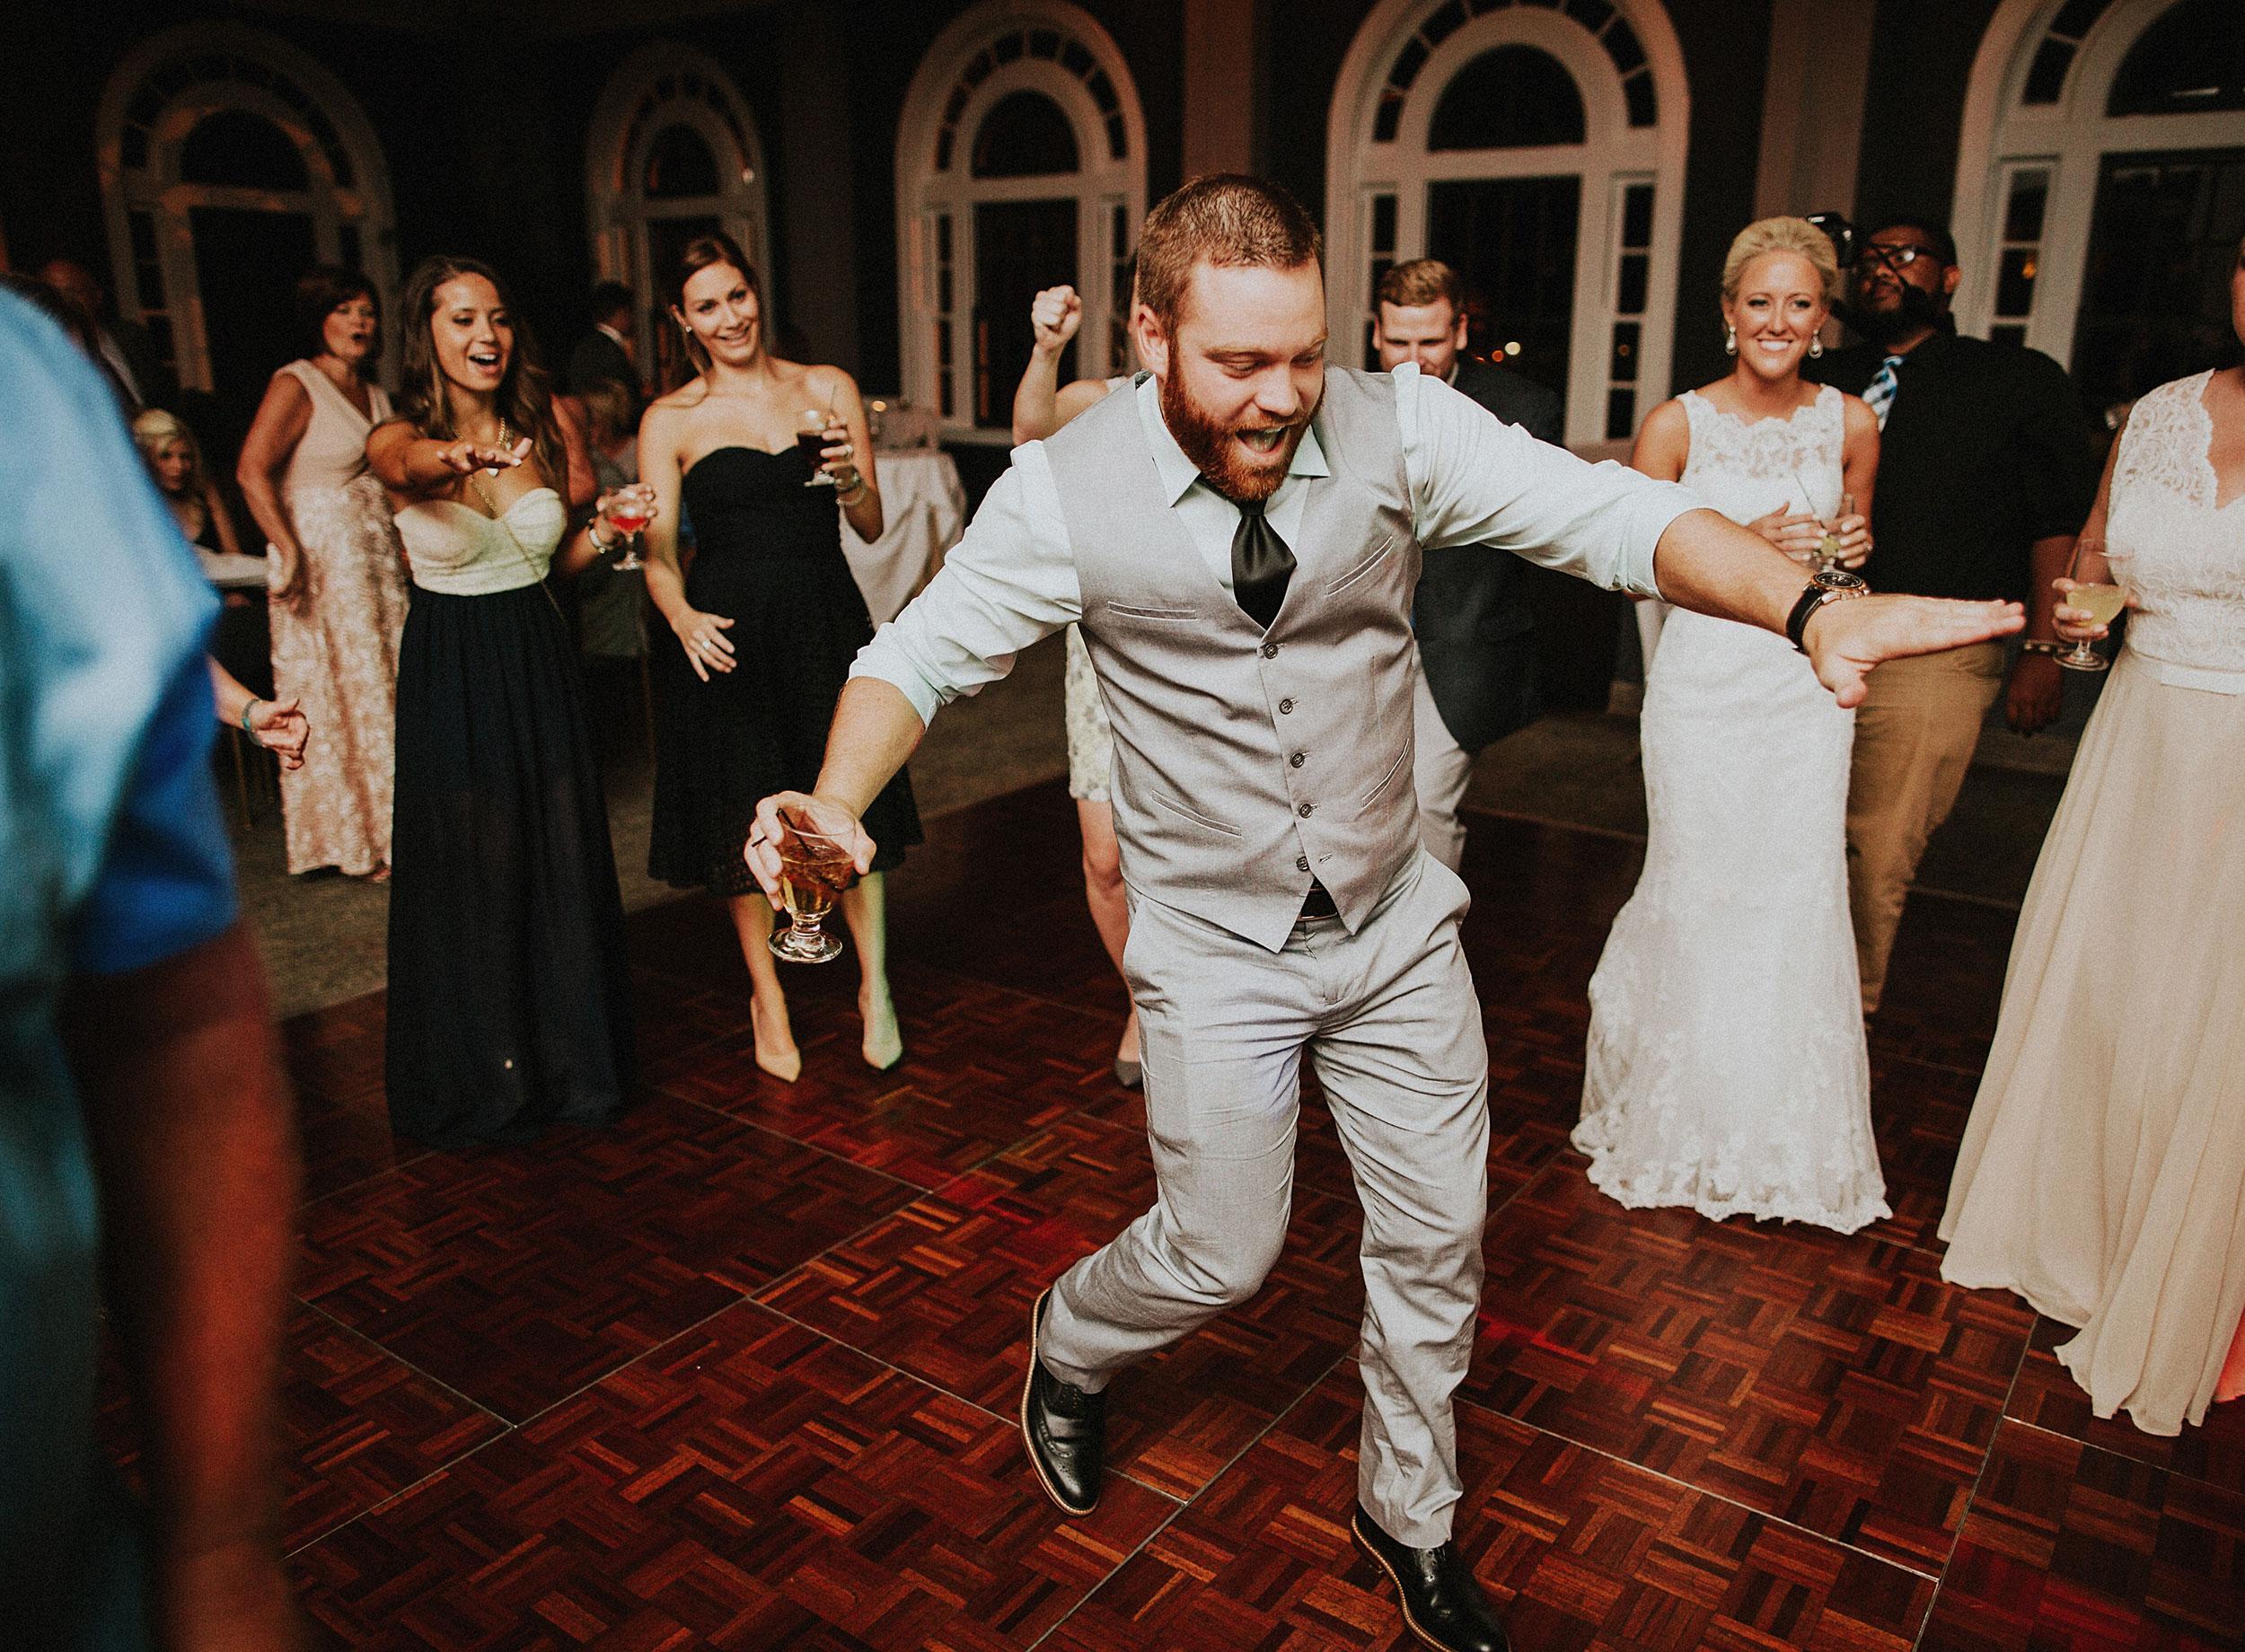 olmsted-wedding-louisville-kentucky-048.JPG